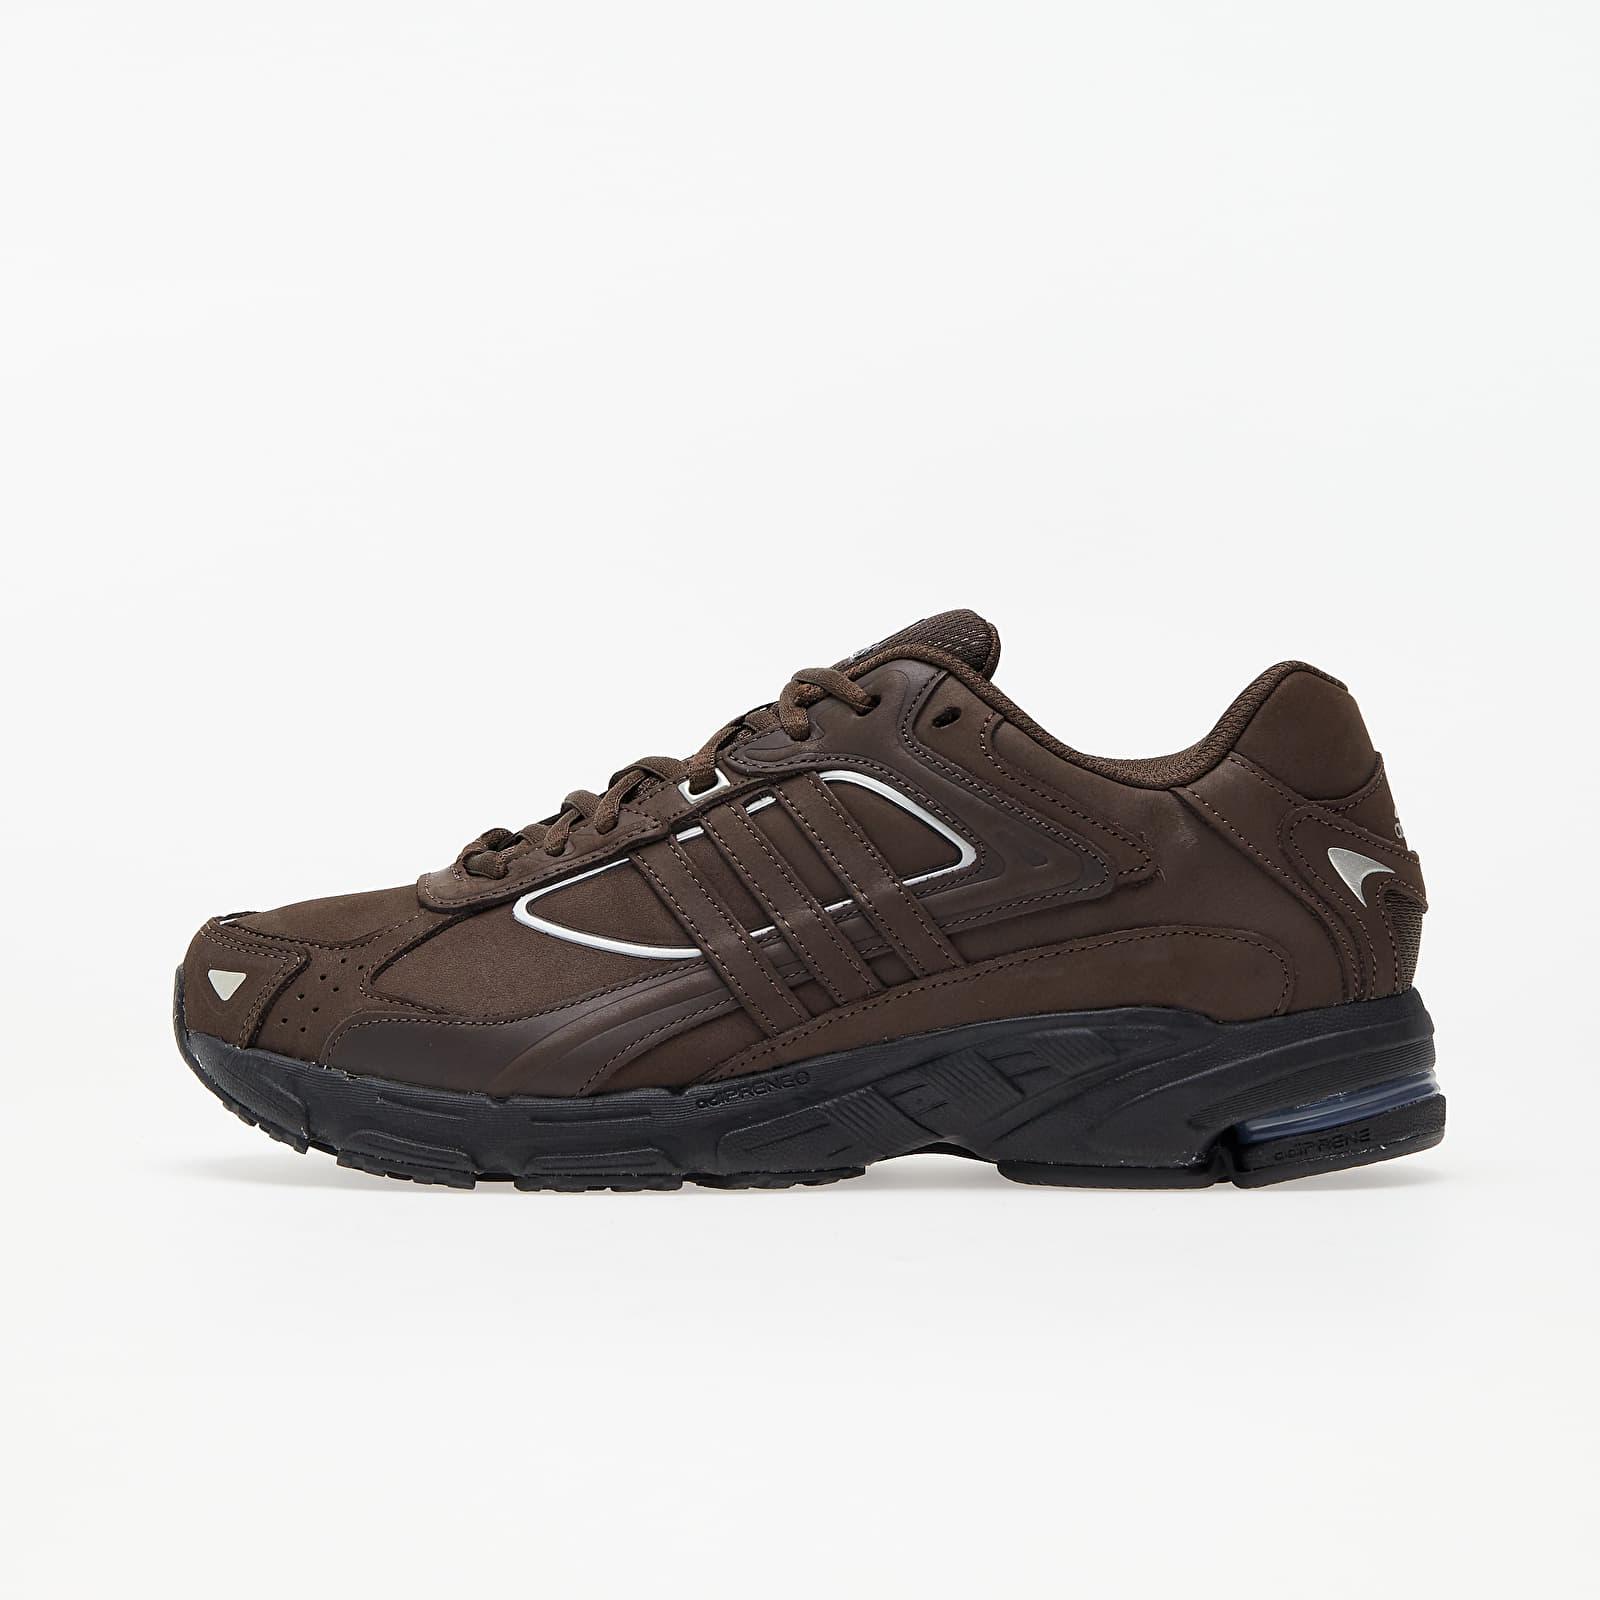 adidas Response Cl Brown/ Core Black/ Brown FX7727